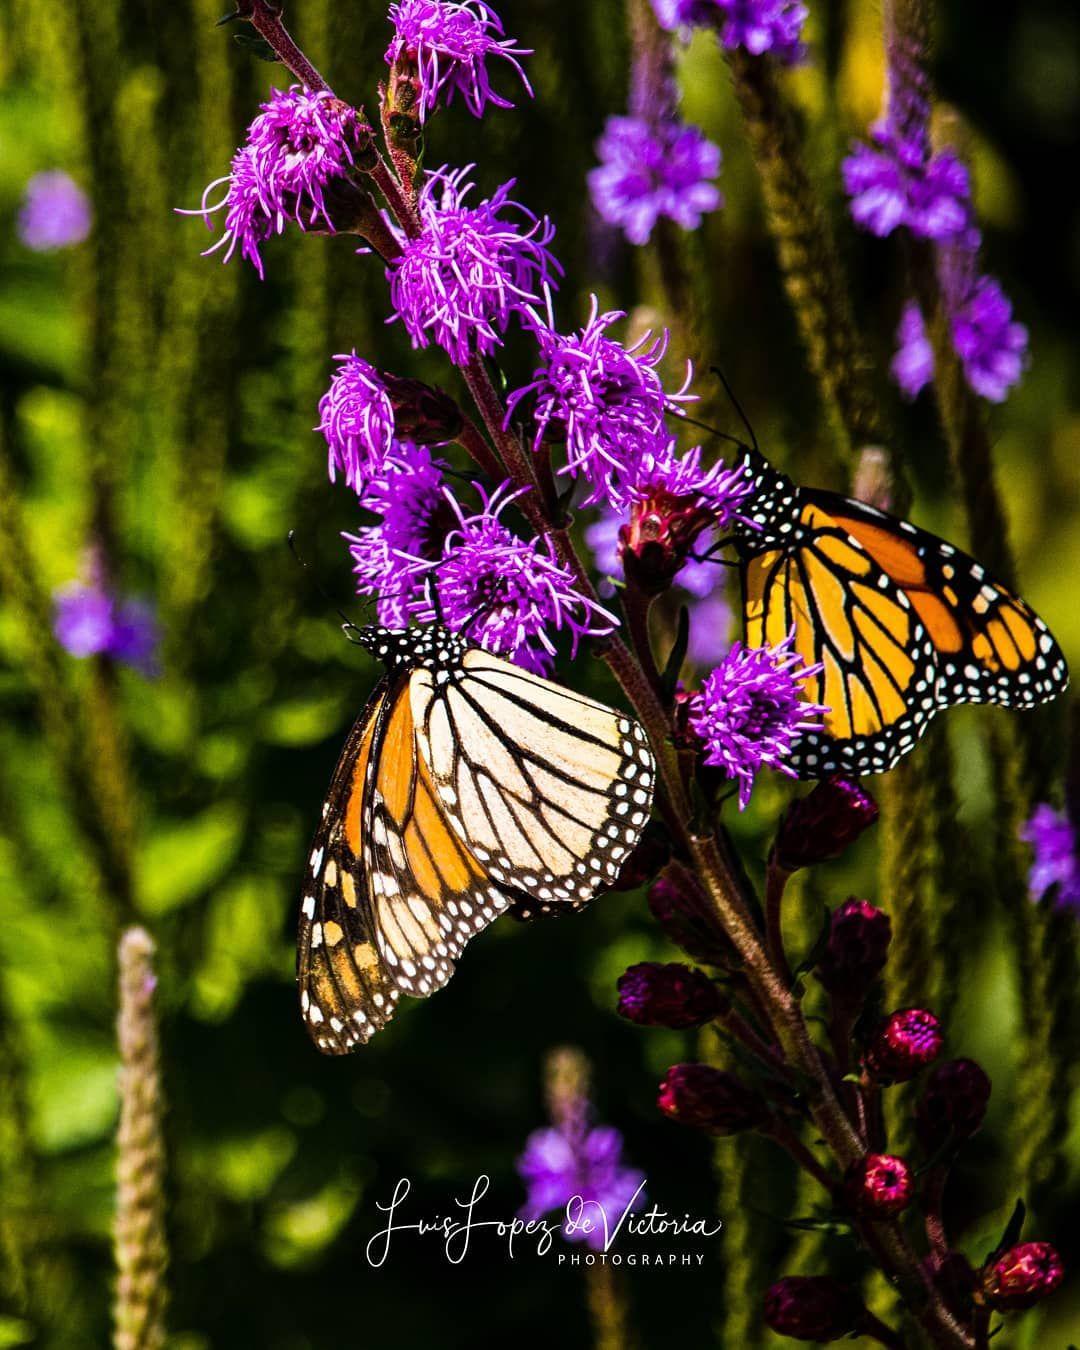 Encuentra la felicidad en los detalles pequeños alrededor de ti 🦋 Find happiness in the small details around you. 🦋 Mariposa Monarca // Monarch Butterfly 🦋 #Monarch #Butterfly #Mariposa #Insects #Fly #happy #nature #instanature #flower #flowerpower #flowers #garden #natural #naturaleza #photooftheday #Photography #monarchbutterfly #comunidadcreativadepr #amor  @minnesotaexposure #minnesotaexposure @thisismyminnesota #thisismymn @captureminnesota #captureminnesota @captivatemn #captivatemn @ex